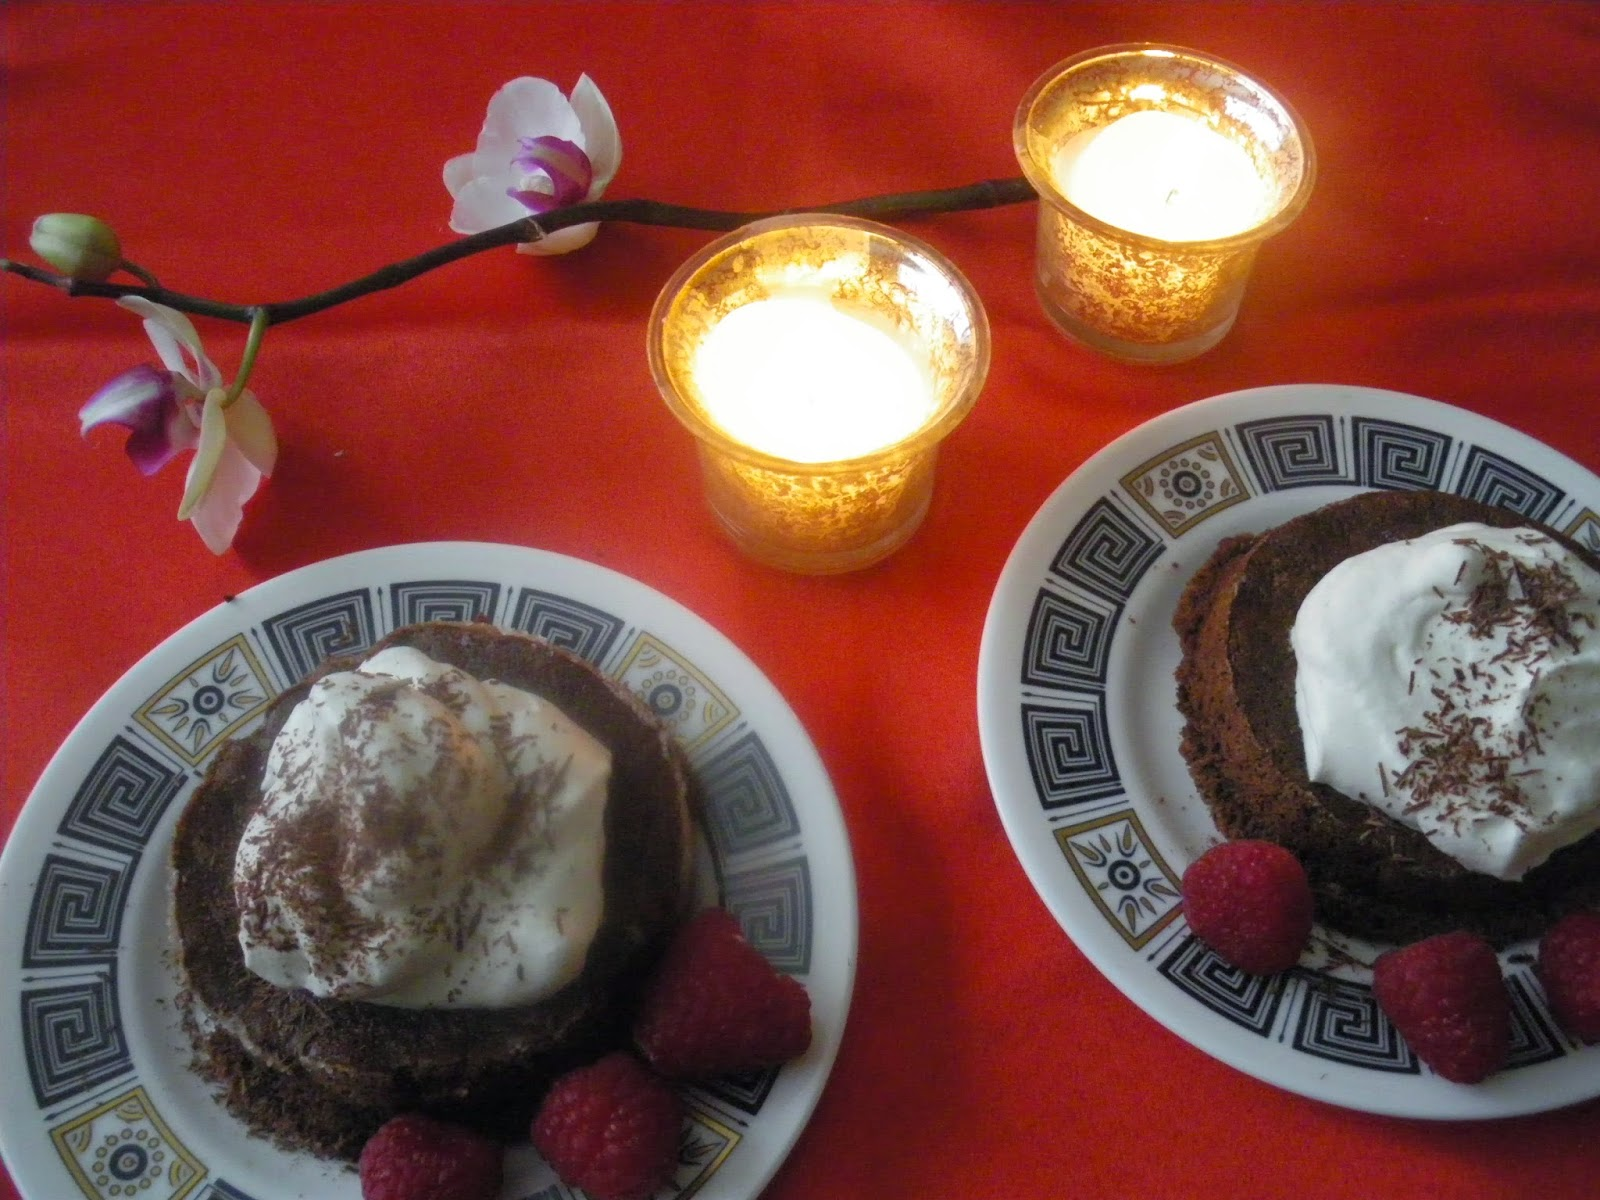 ... : Flourless Dark Chocolate Mini-Soufflés with Grand Marnier Cream